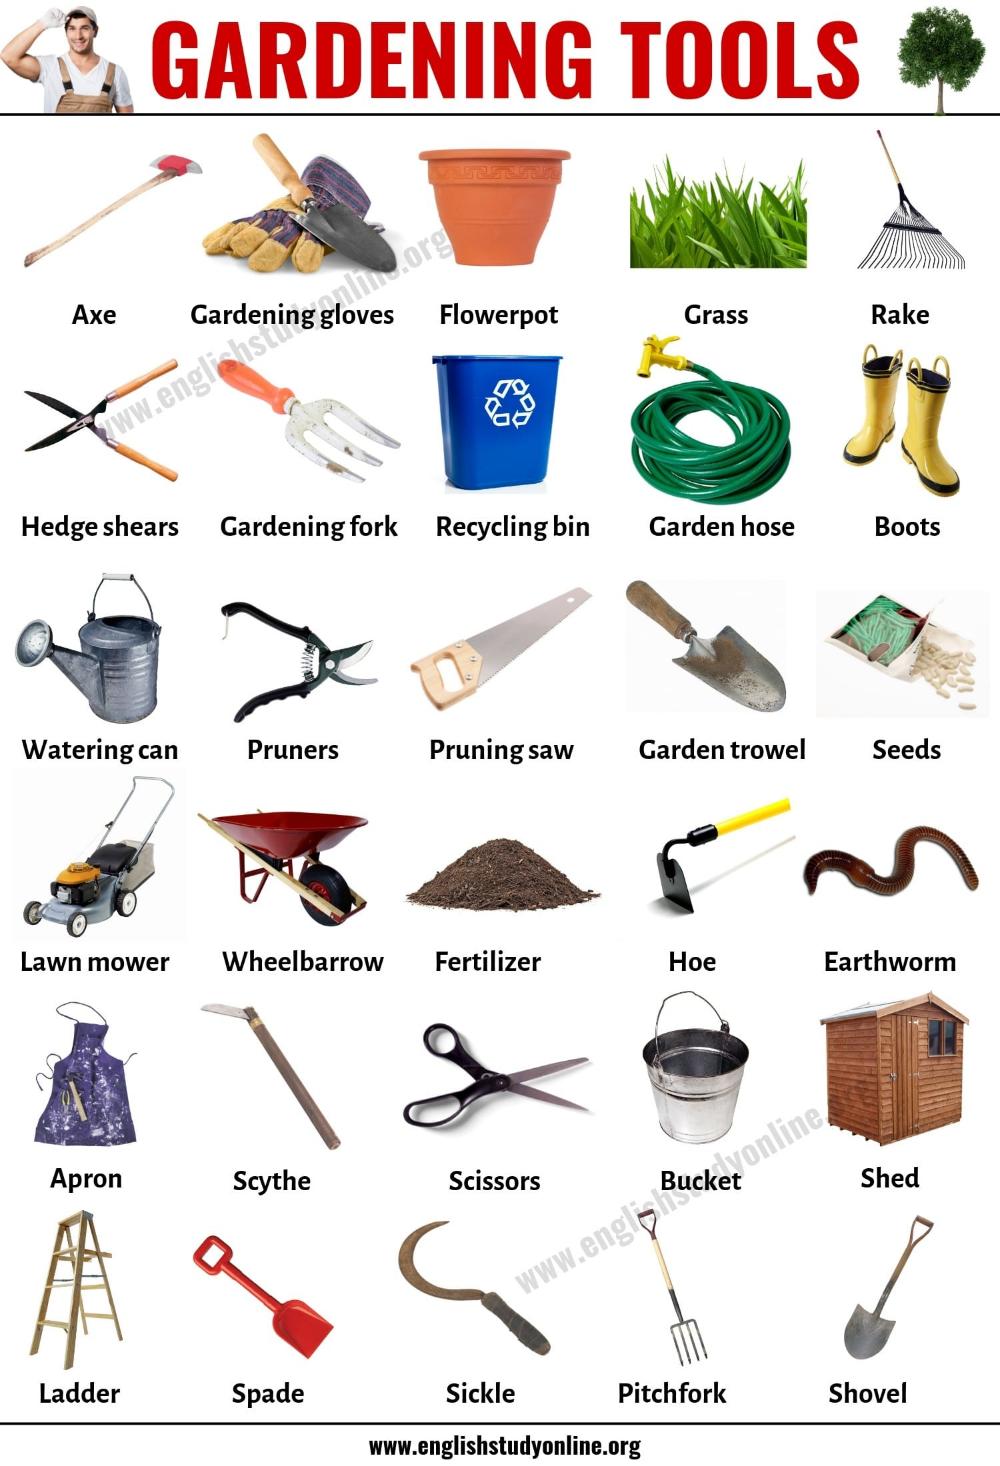 ab9d194bd69d2a9d53d49478a63722ae - What Are Tools Used For Gardening